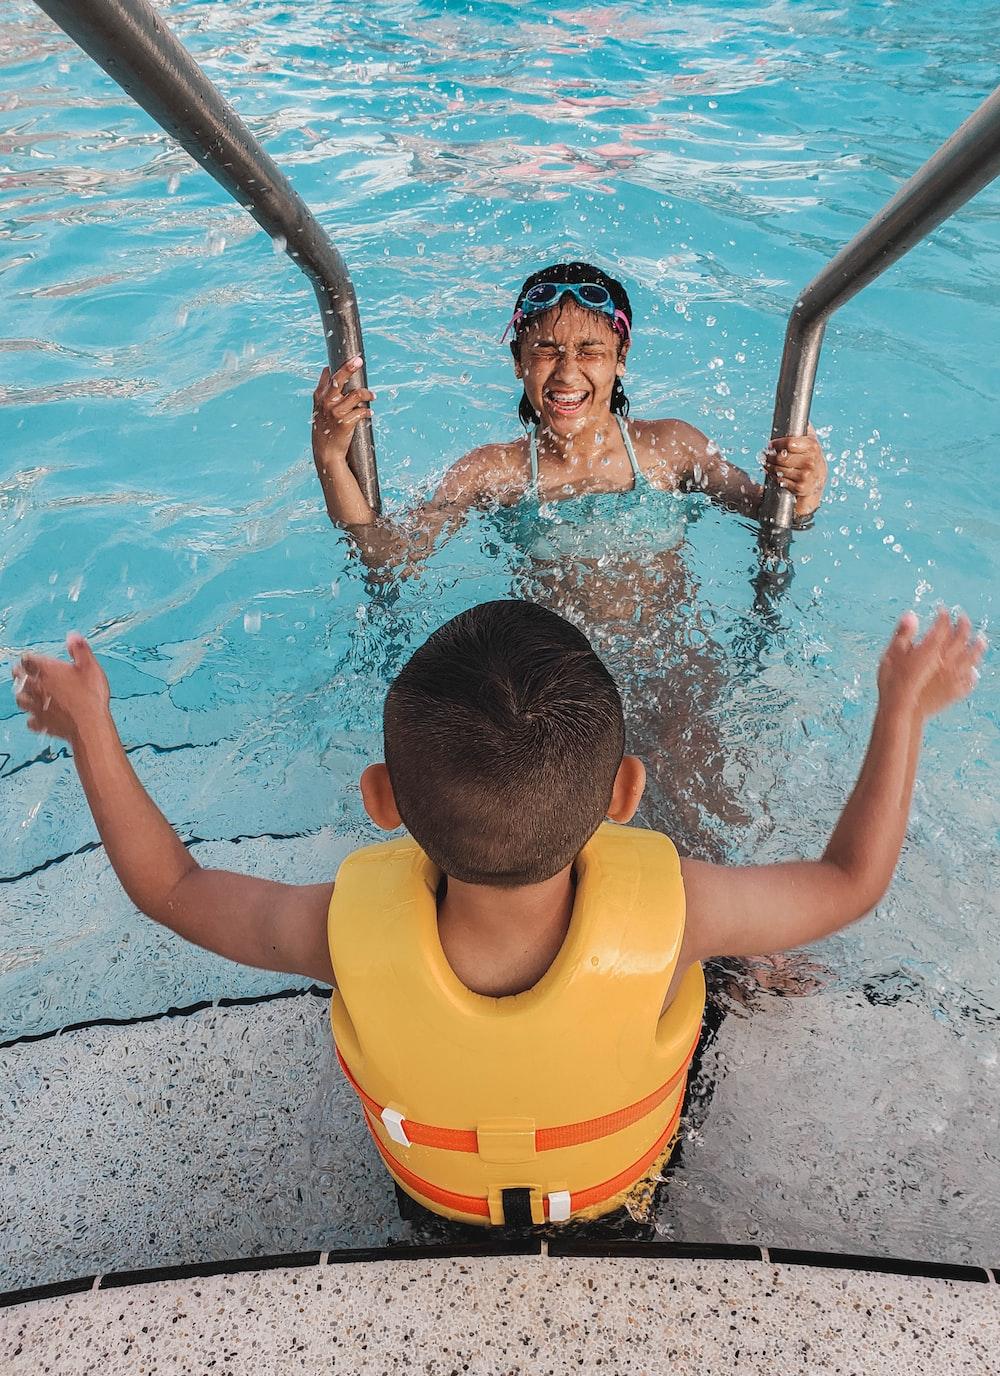 toddler in swimming pool